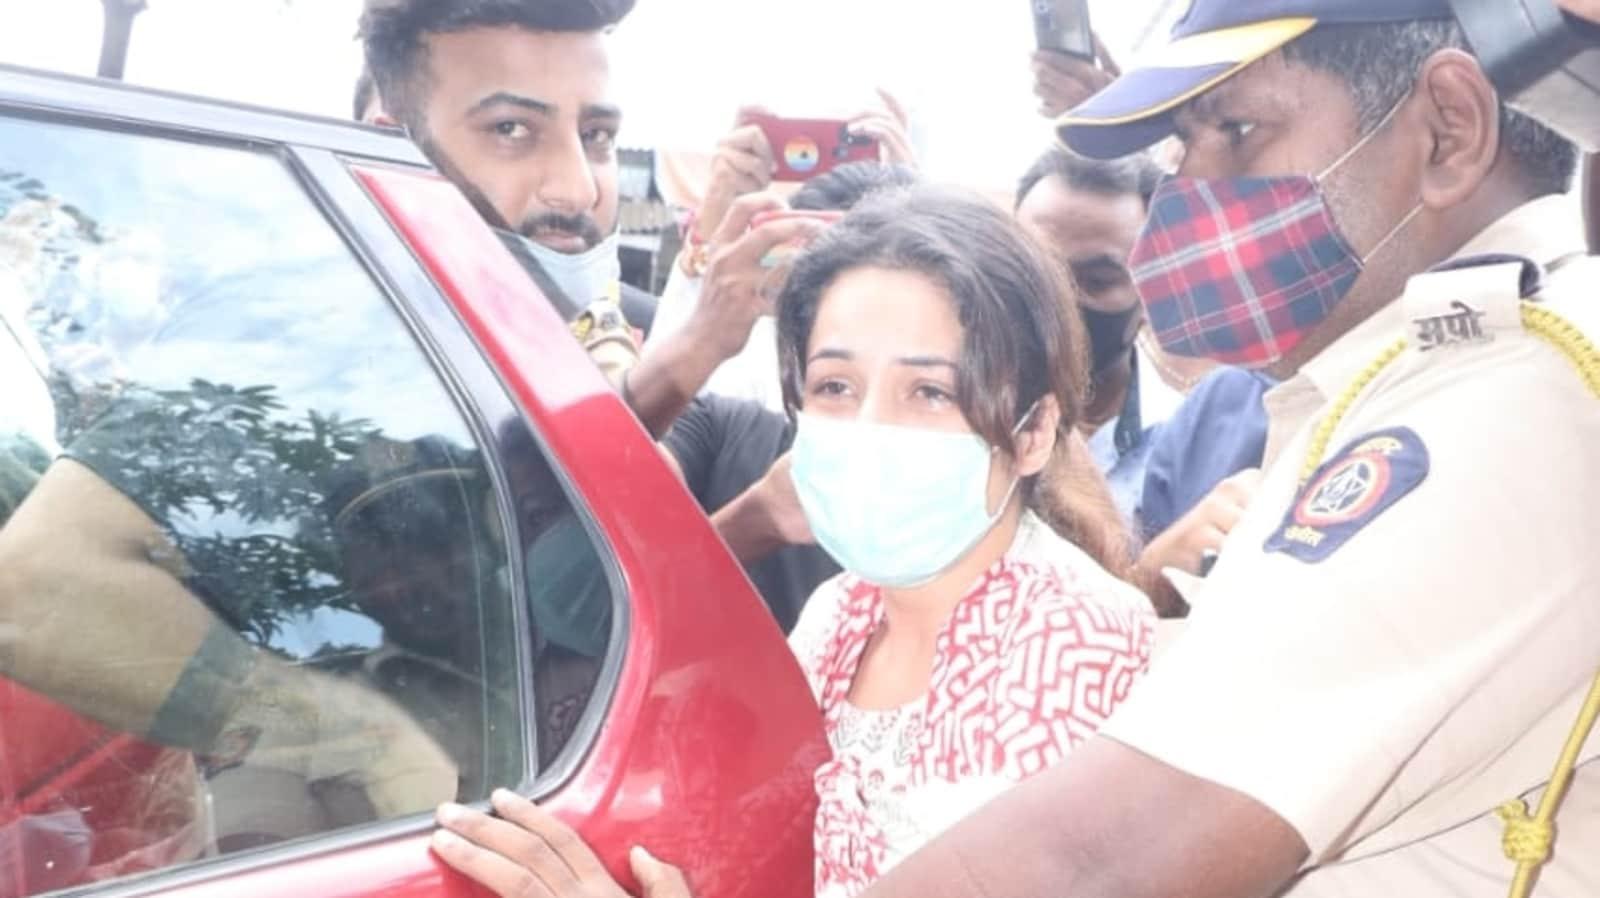 Sidharth Shukla funeral: Shehnaaz Gill attends last rites, races towards  ambulance - Hindustan Times